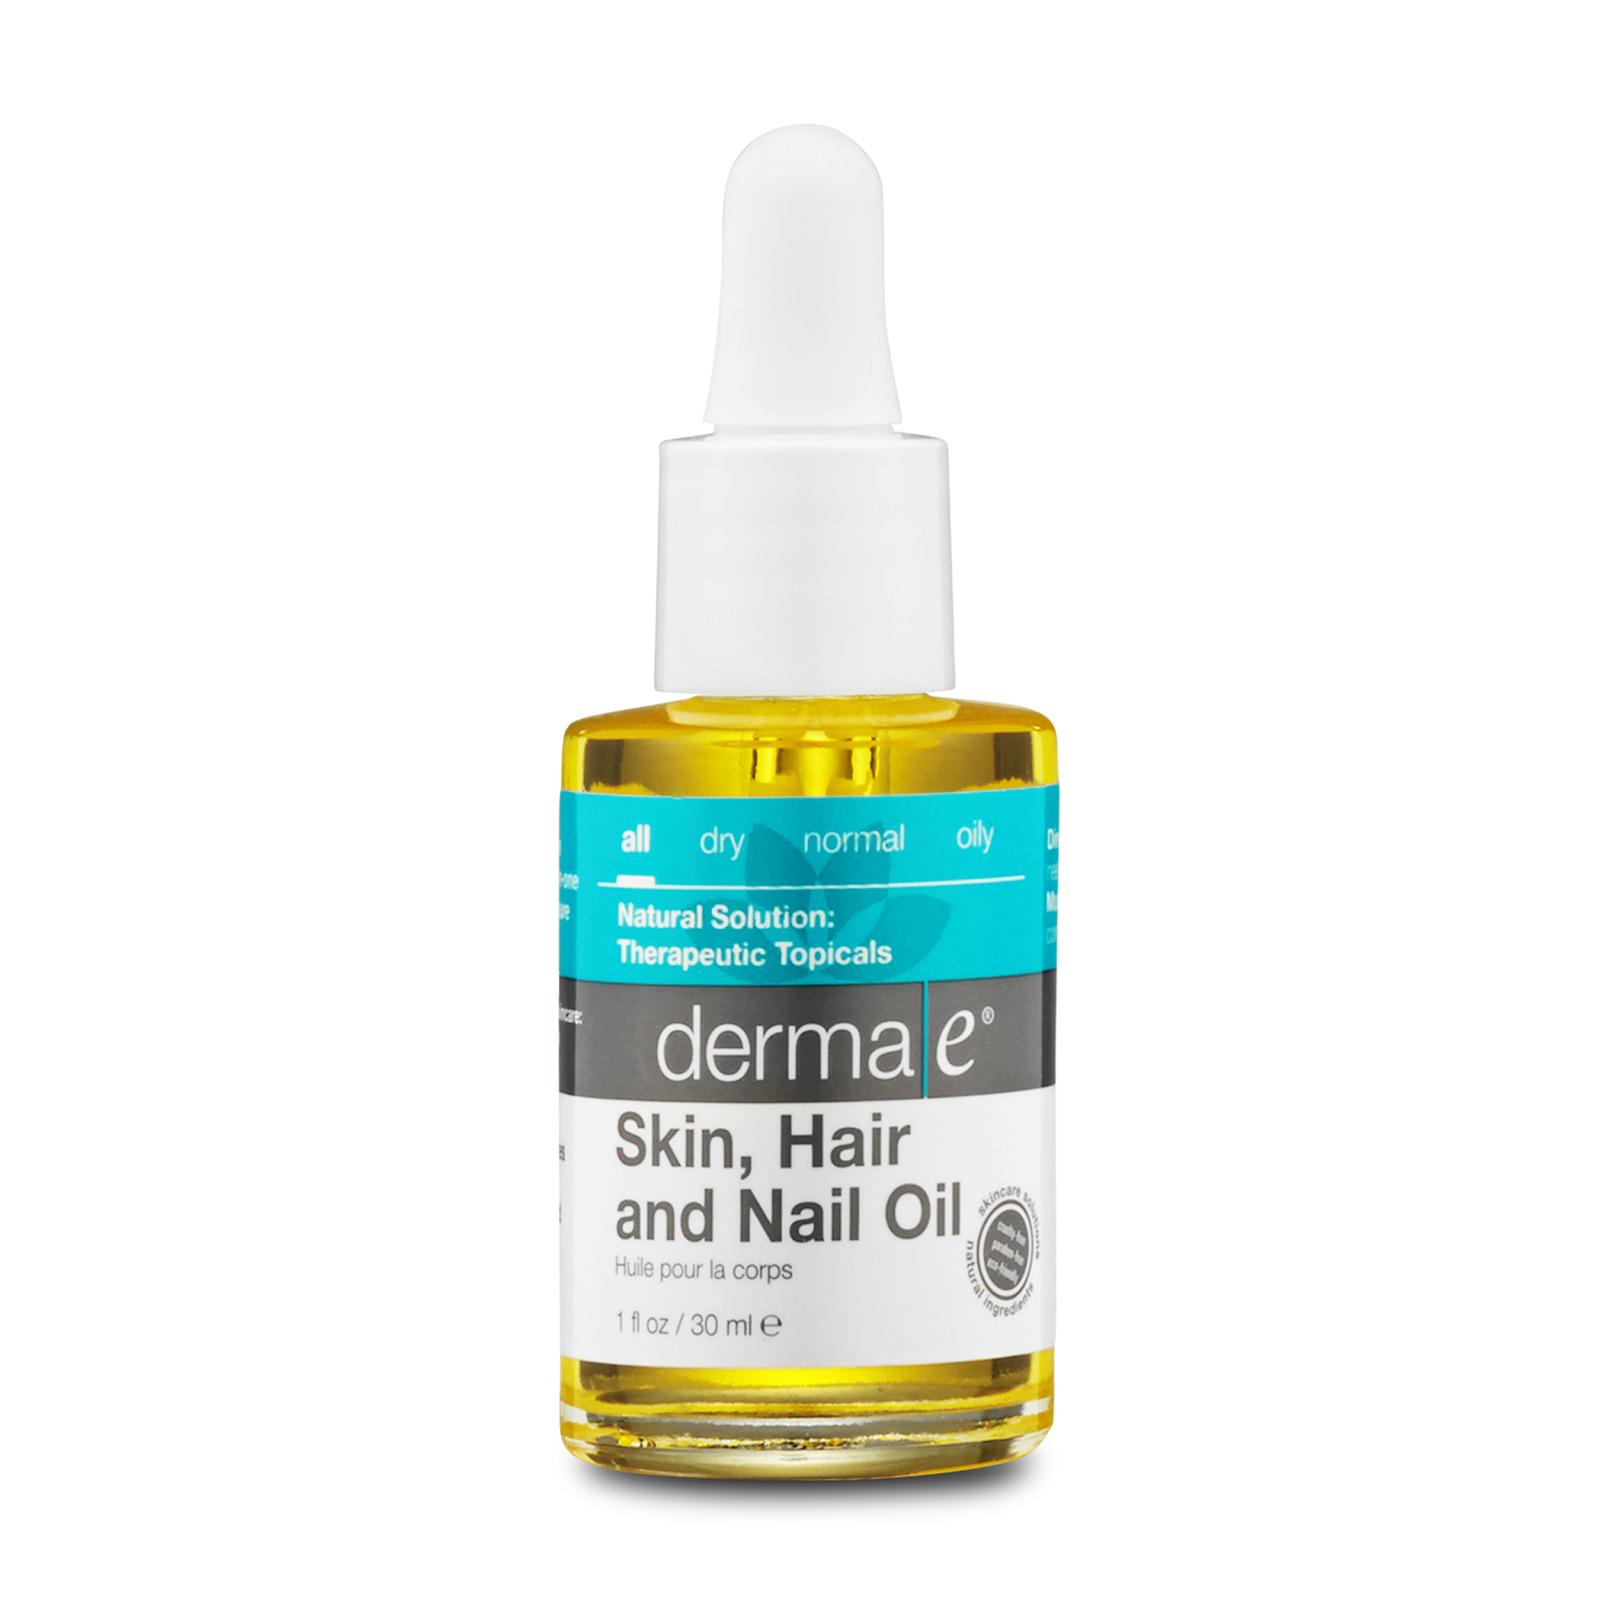 Derma e Therapeutic Topicals Skin, Hair and Nail Oil With Organic Argan, Jojoba and Kukui Oils 1oz, 30ml